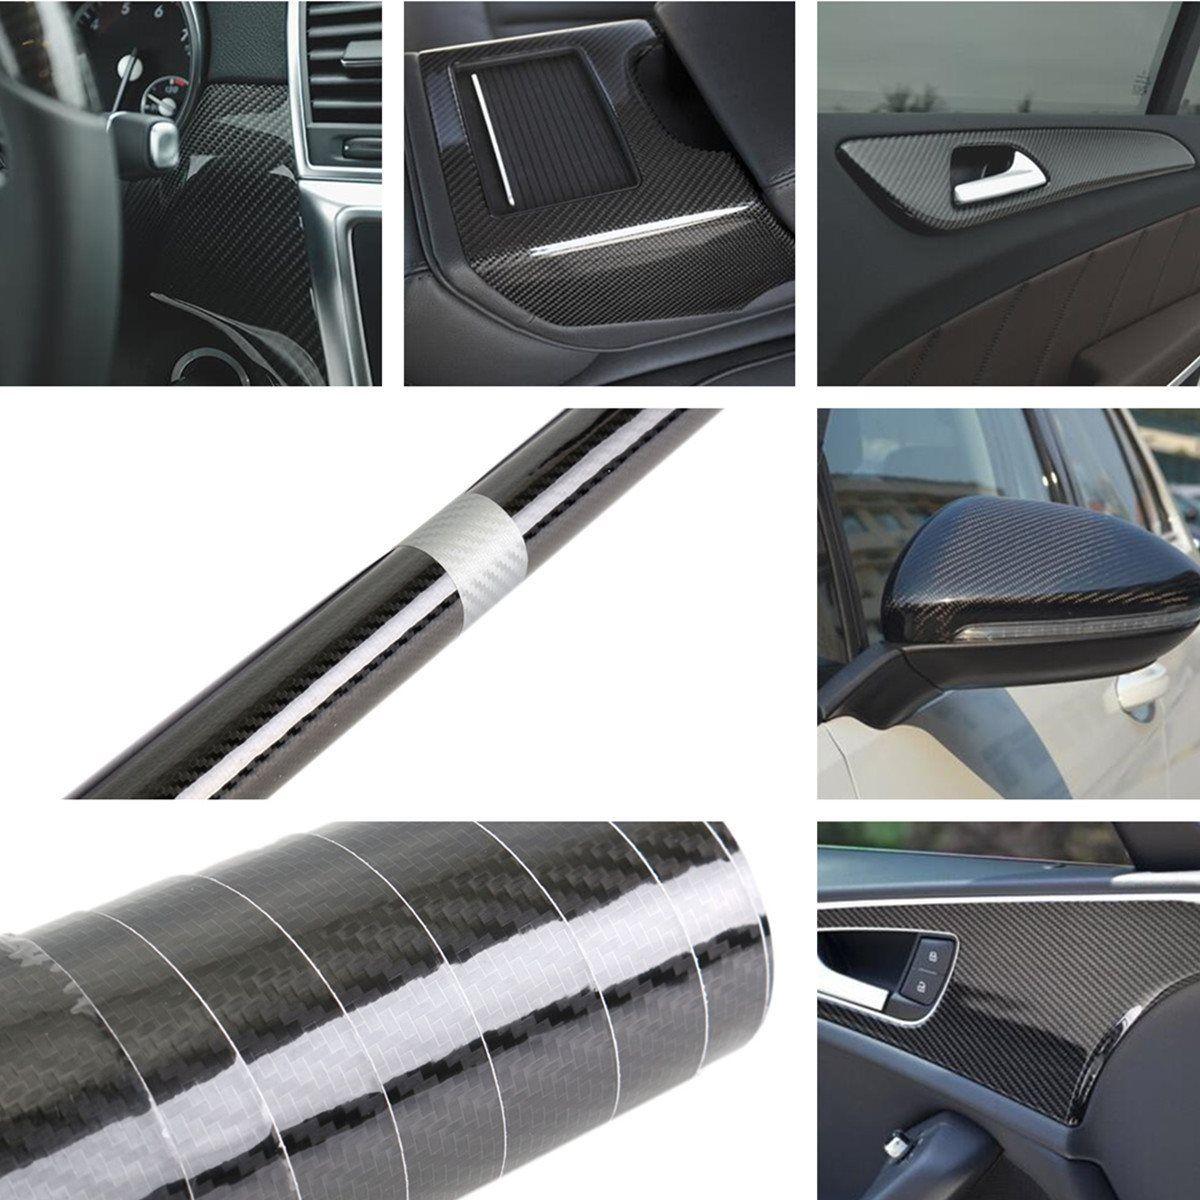 Universal 150 x 35cm Black Car Wrap Roll Sticker PVC 5D Carbon Fiber Vinyl Foil Film Decal For VW /BMW /Honda /Toyota